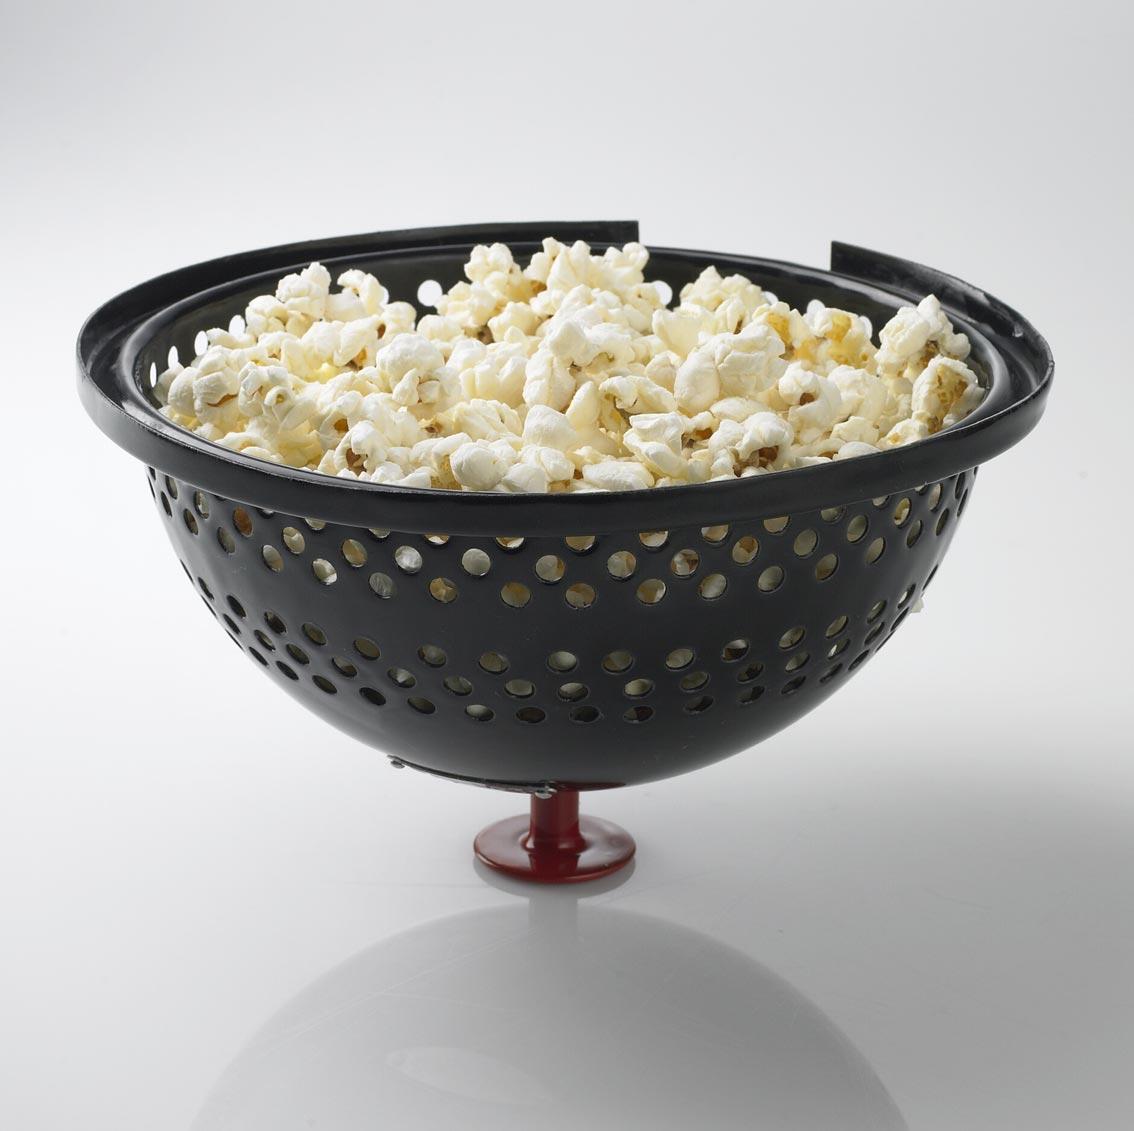 Bon-fire Popcorn Deckel / Poptop schwarz rot Ø 20 cm Bild 2